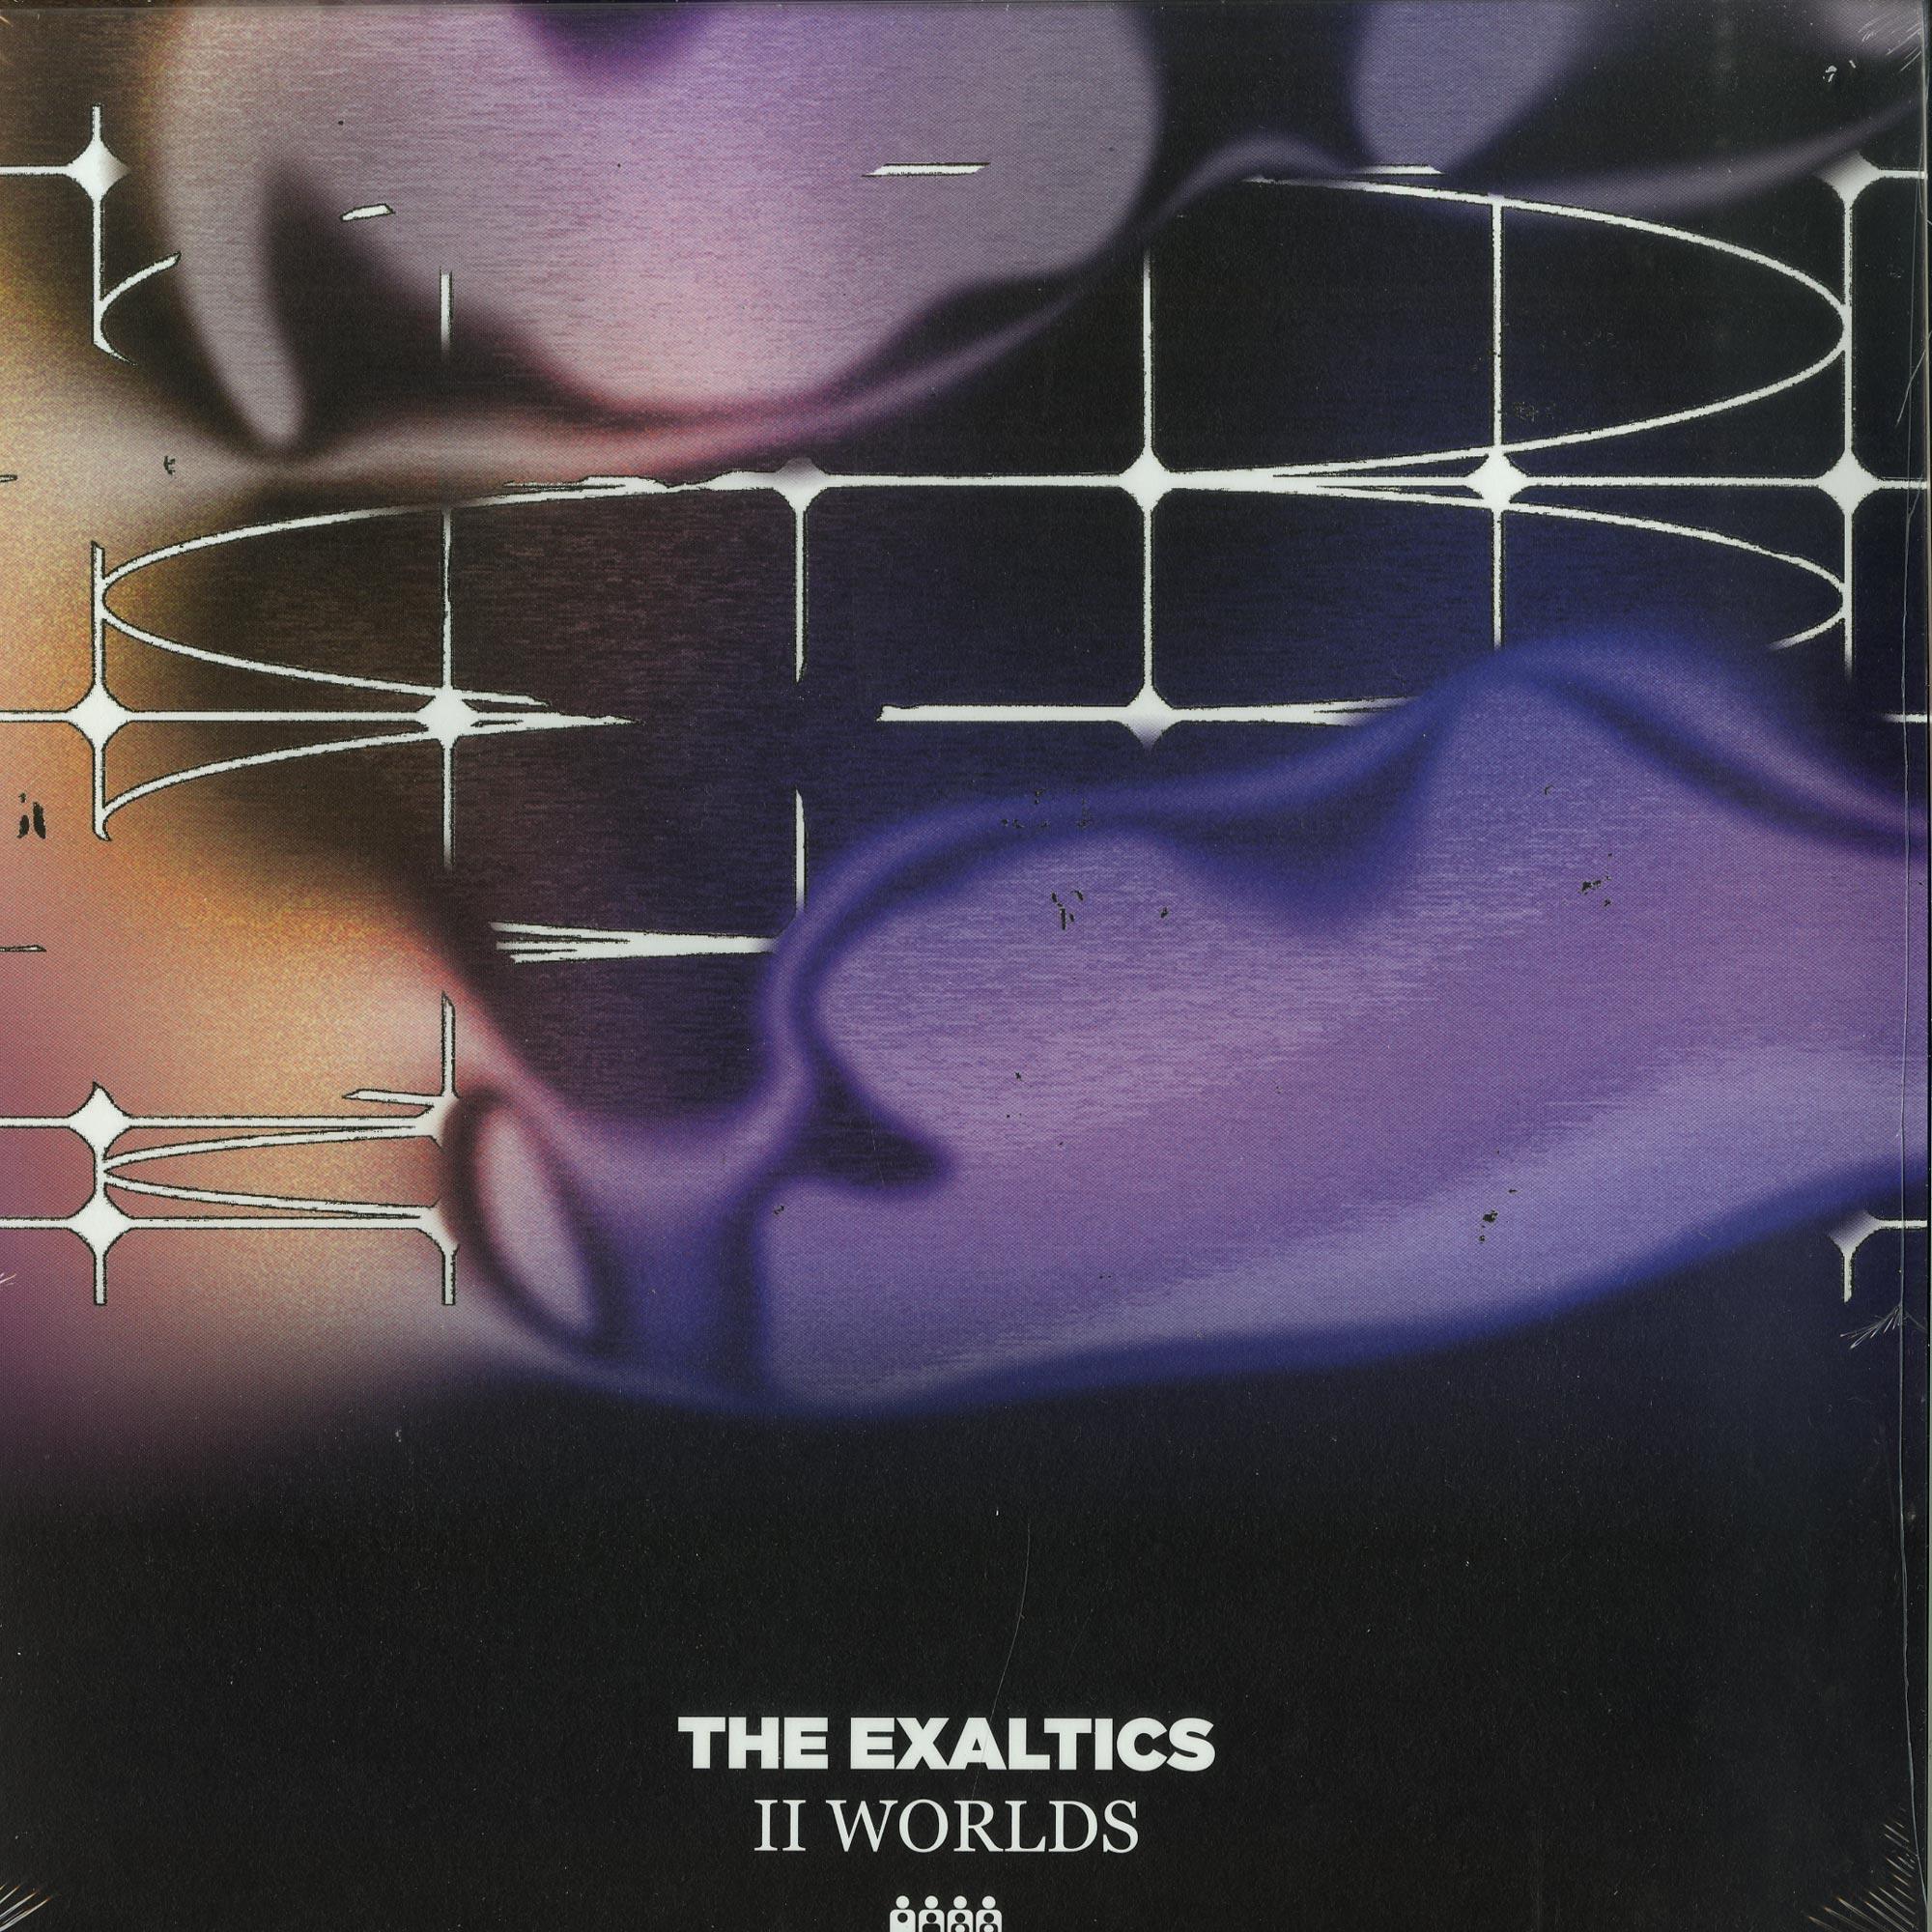 The Exaltics - II WORLDS